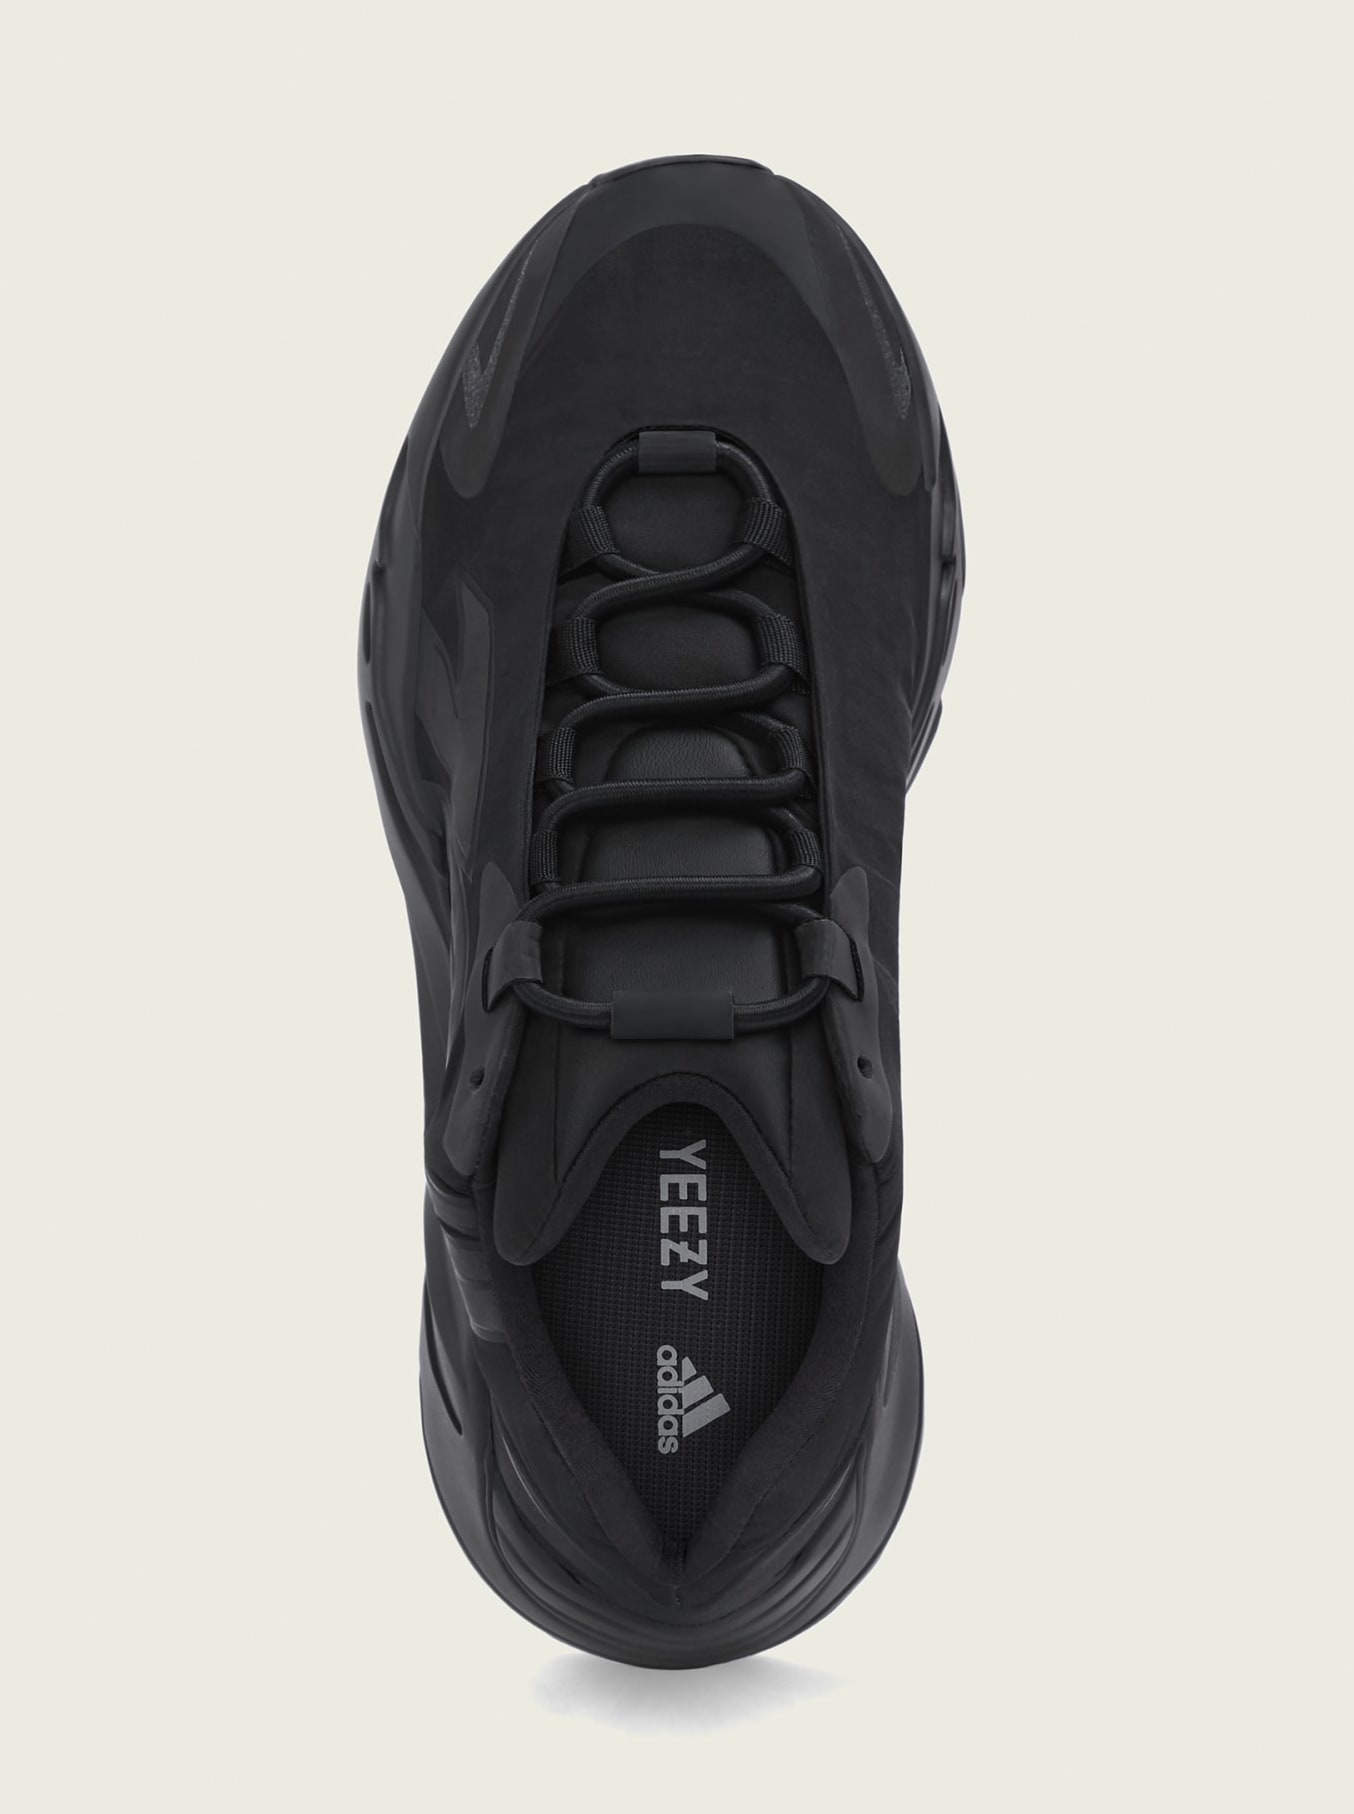 Adidas Yeezy Boost 700 MNVN 'Black' FV4440 Top